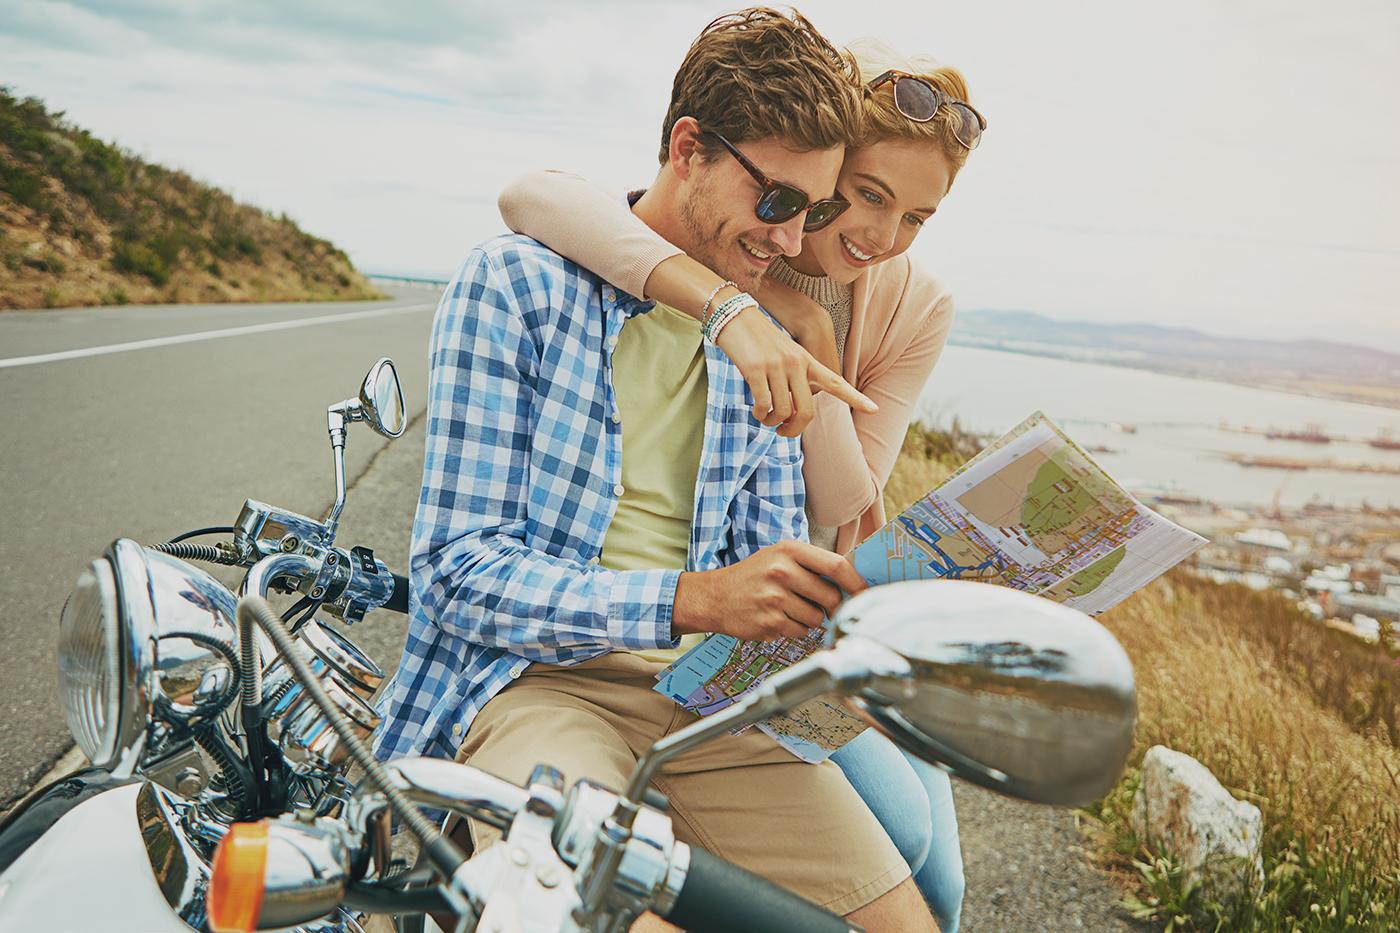 Motorcycle & ATV Loan | Elements Financial